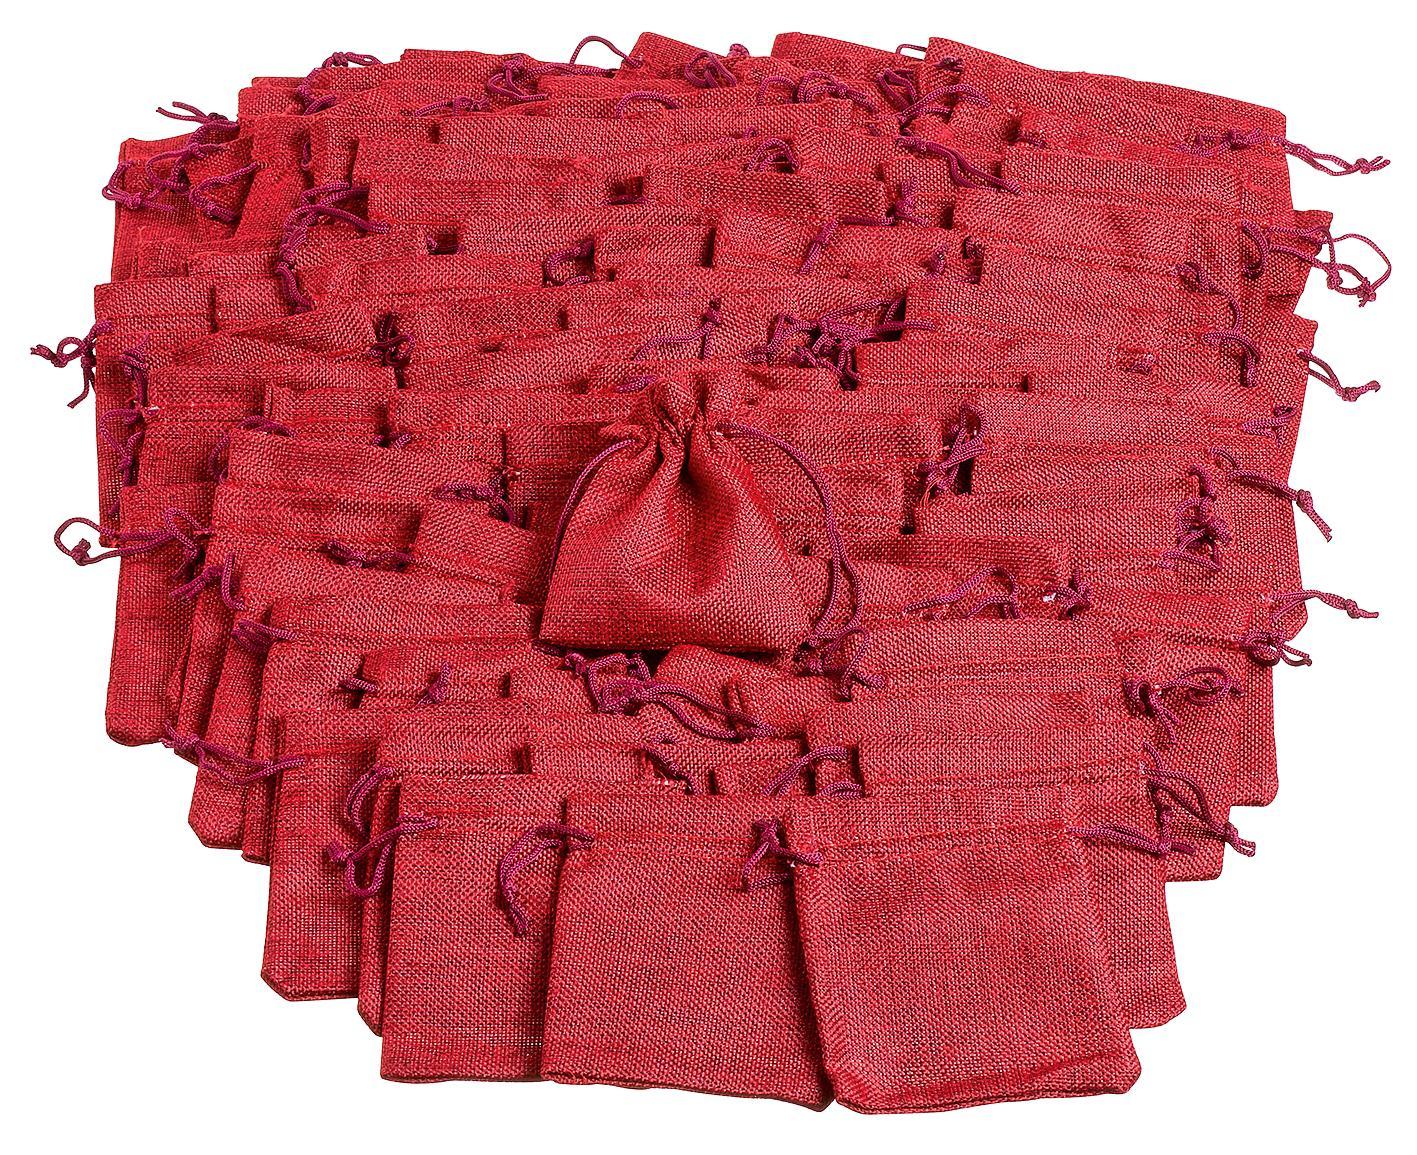 100 sachets en jute rouge gros acheteurs vbs loisirs cr atifs vbs hobby. Black Bedroom Furniture Sets. Home Design Ideas